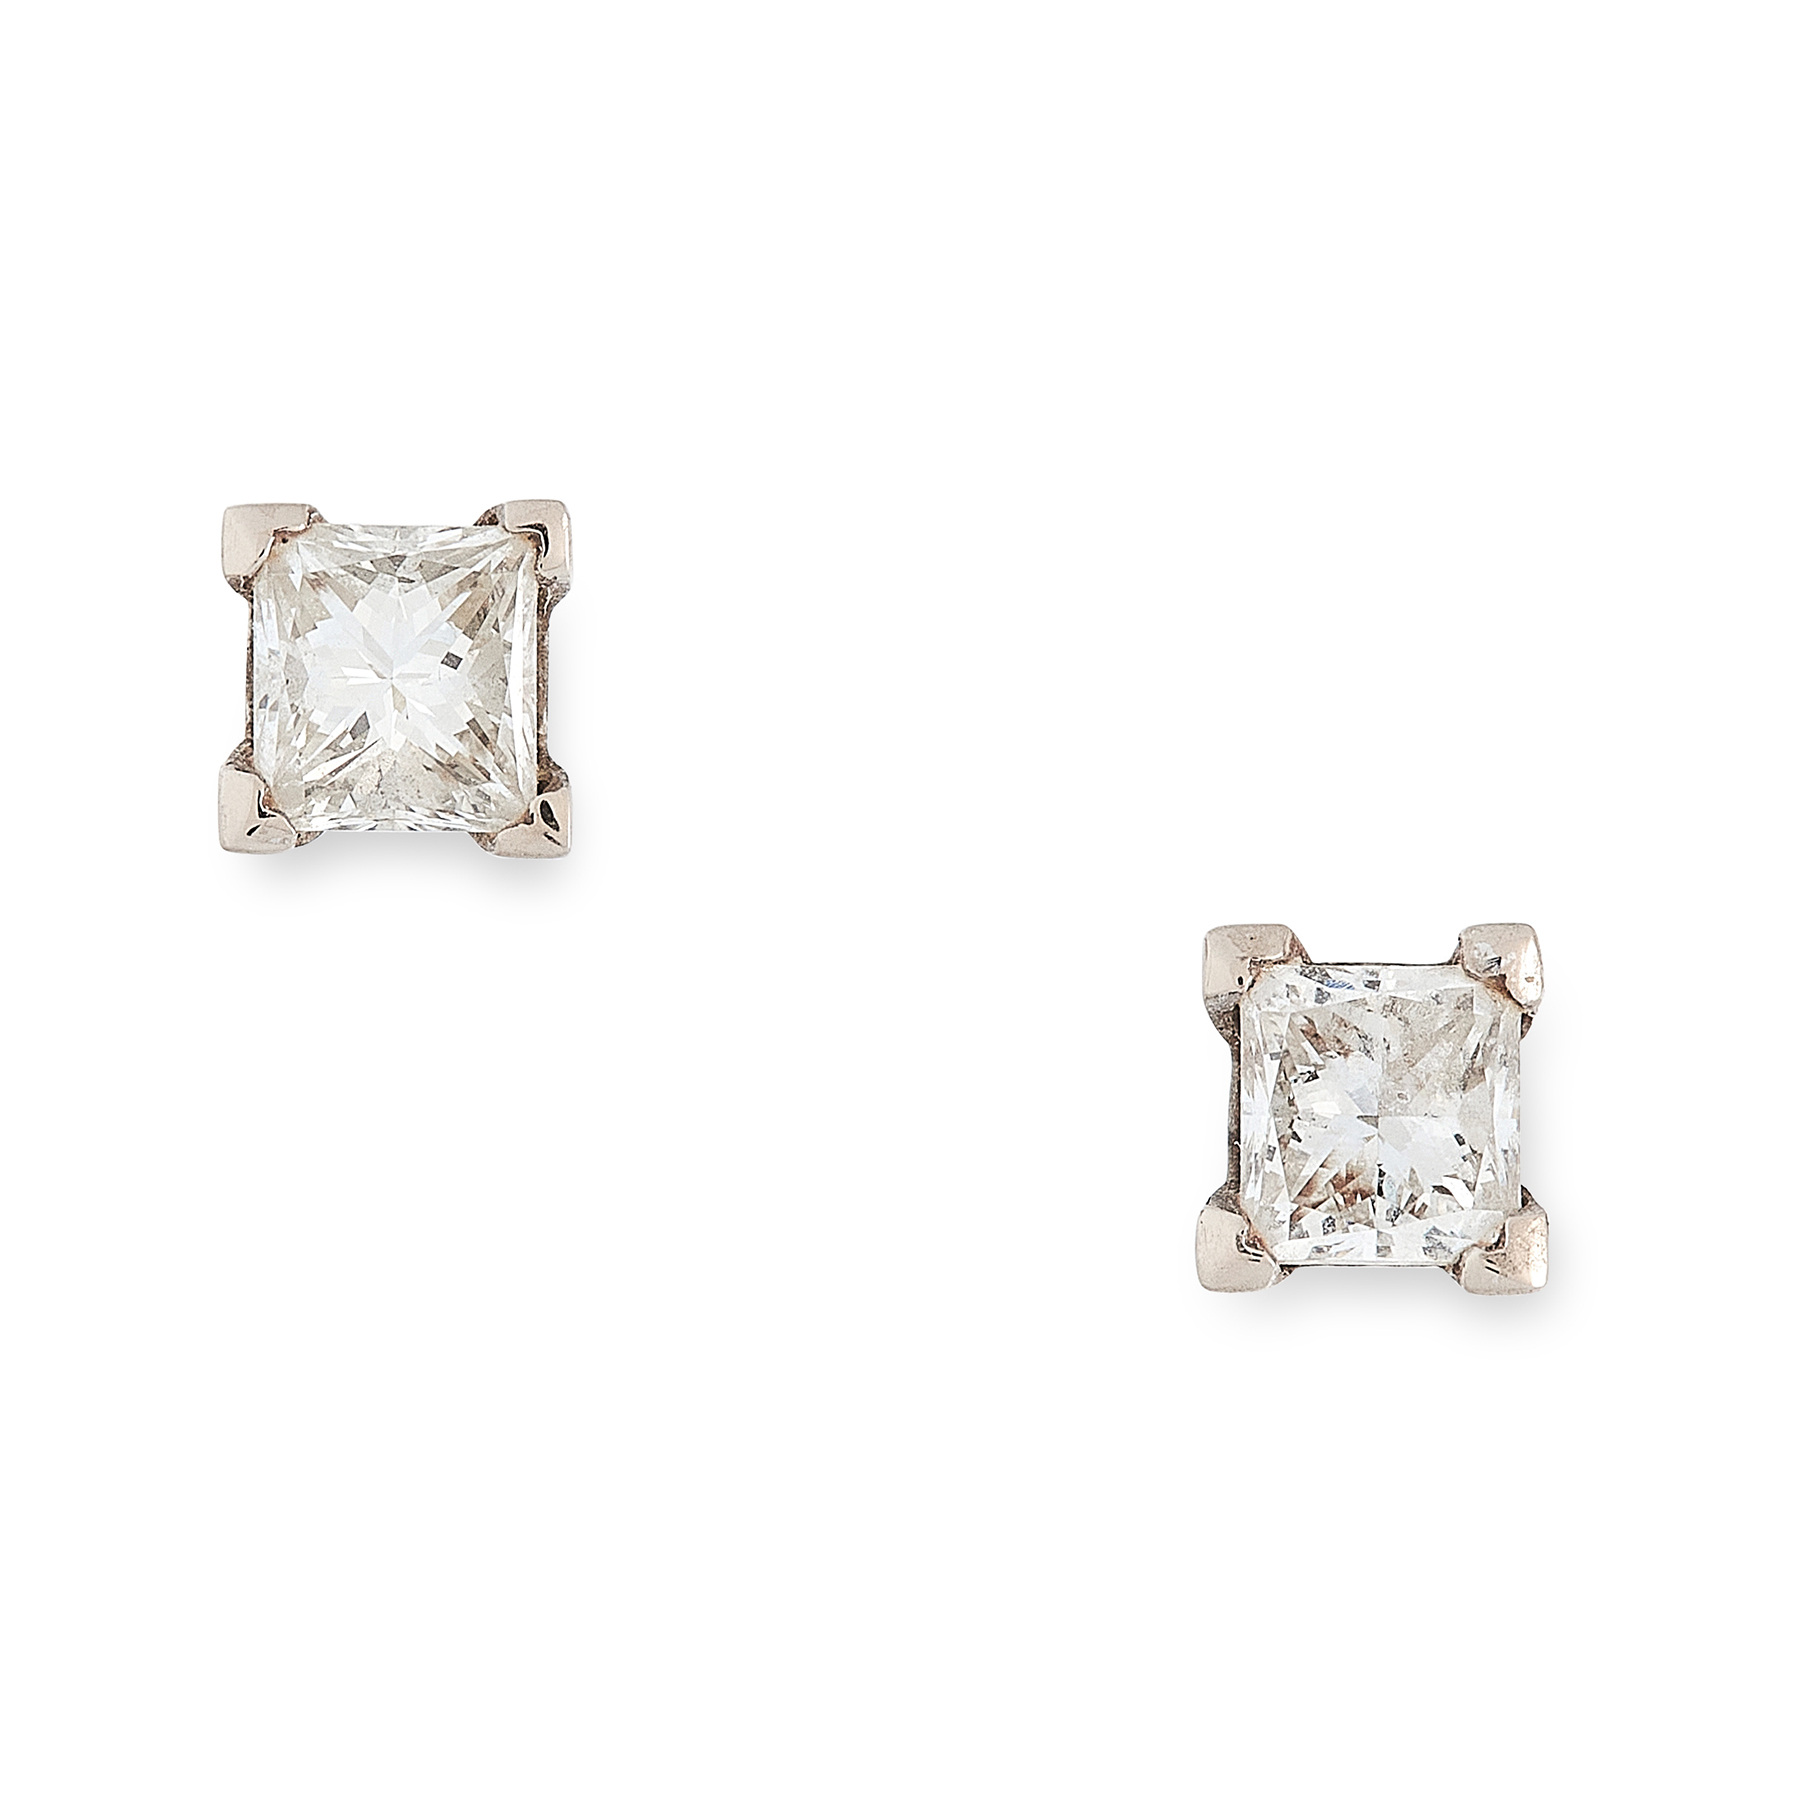 A PAIR OF 0.94 CARAT DIAMOND STUD EARRINGS each set with an princess cut diamond of 0.48 and 0.46